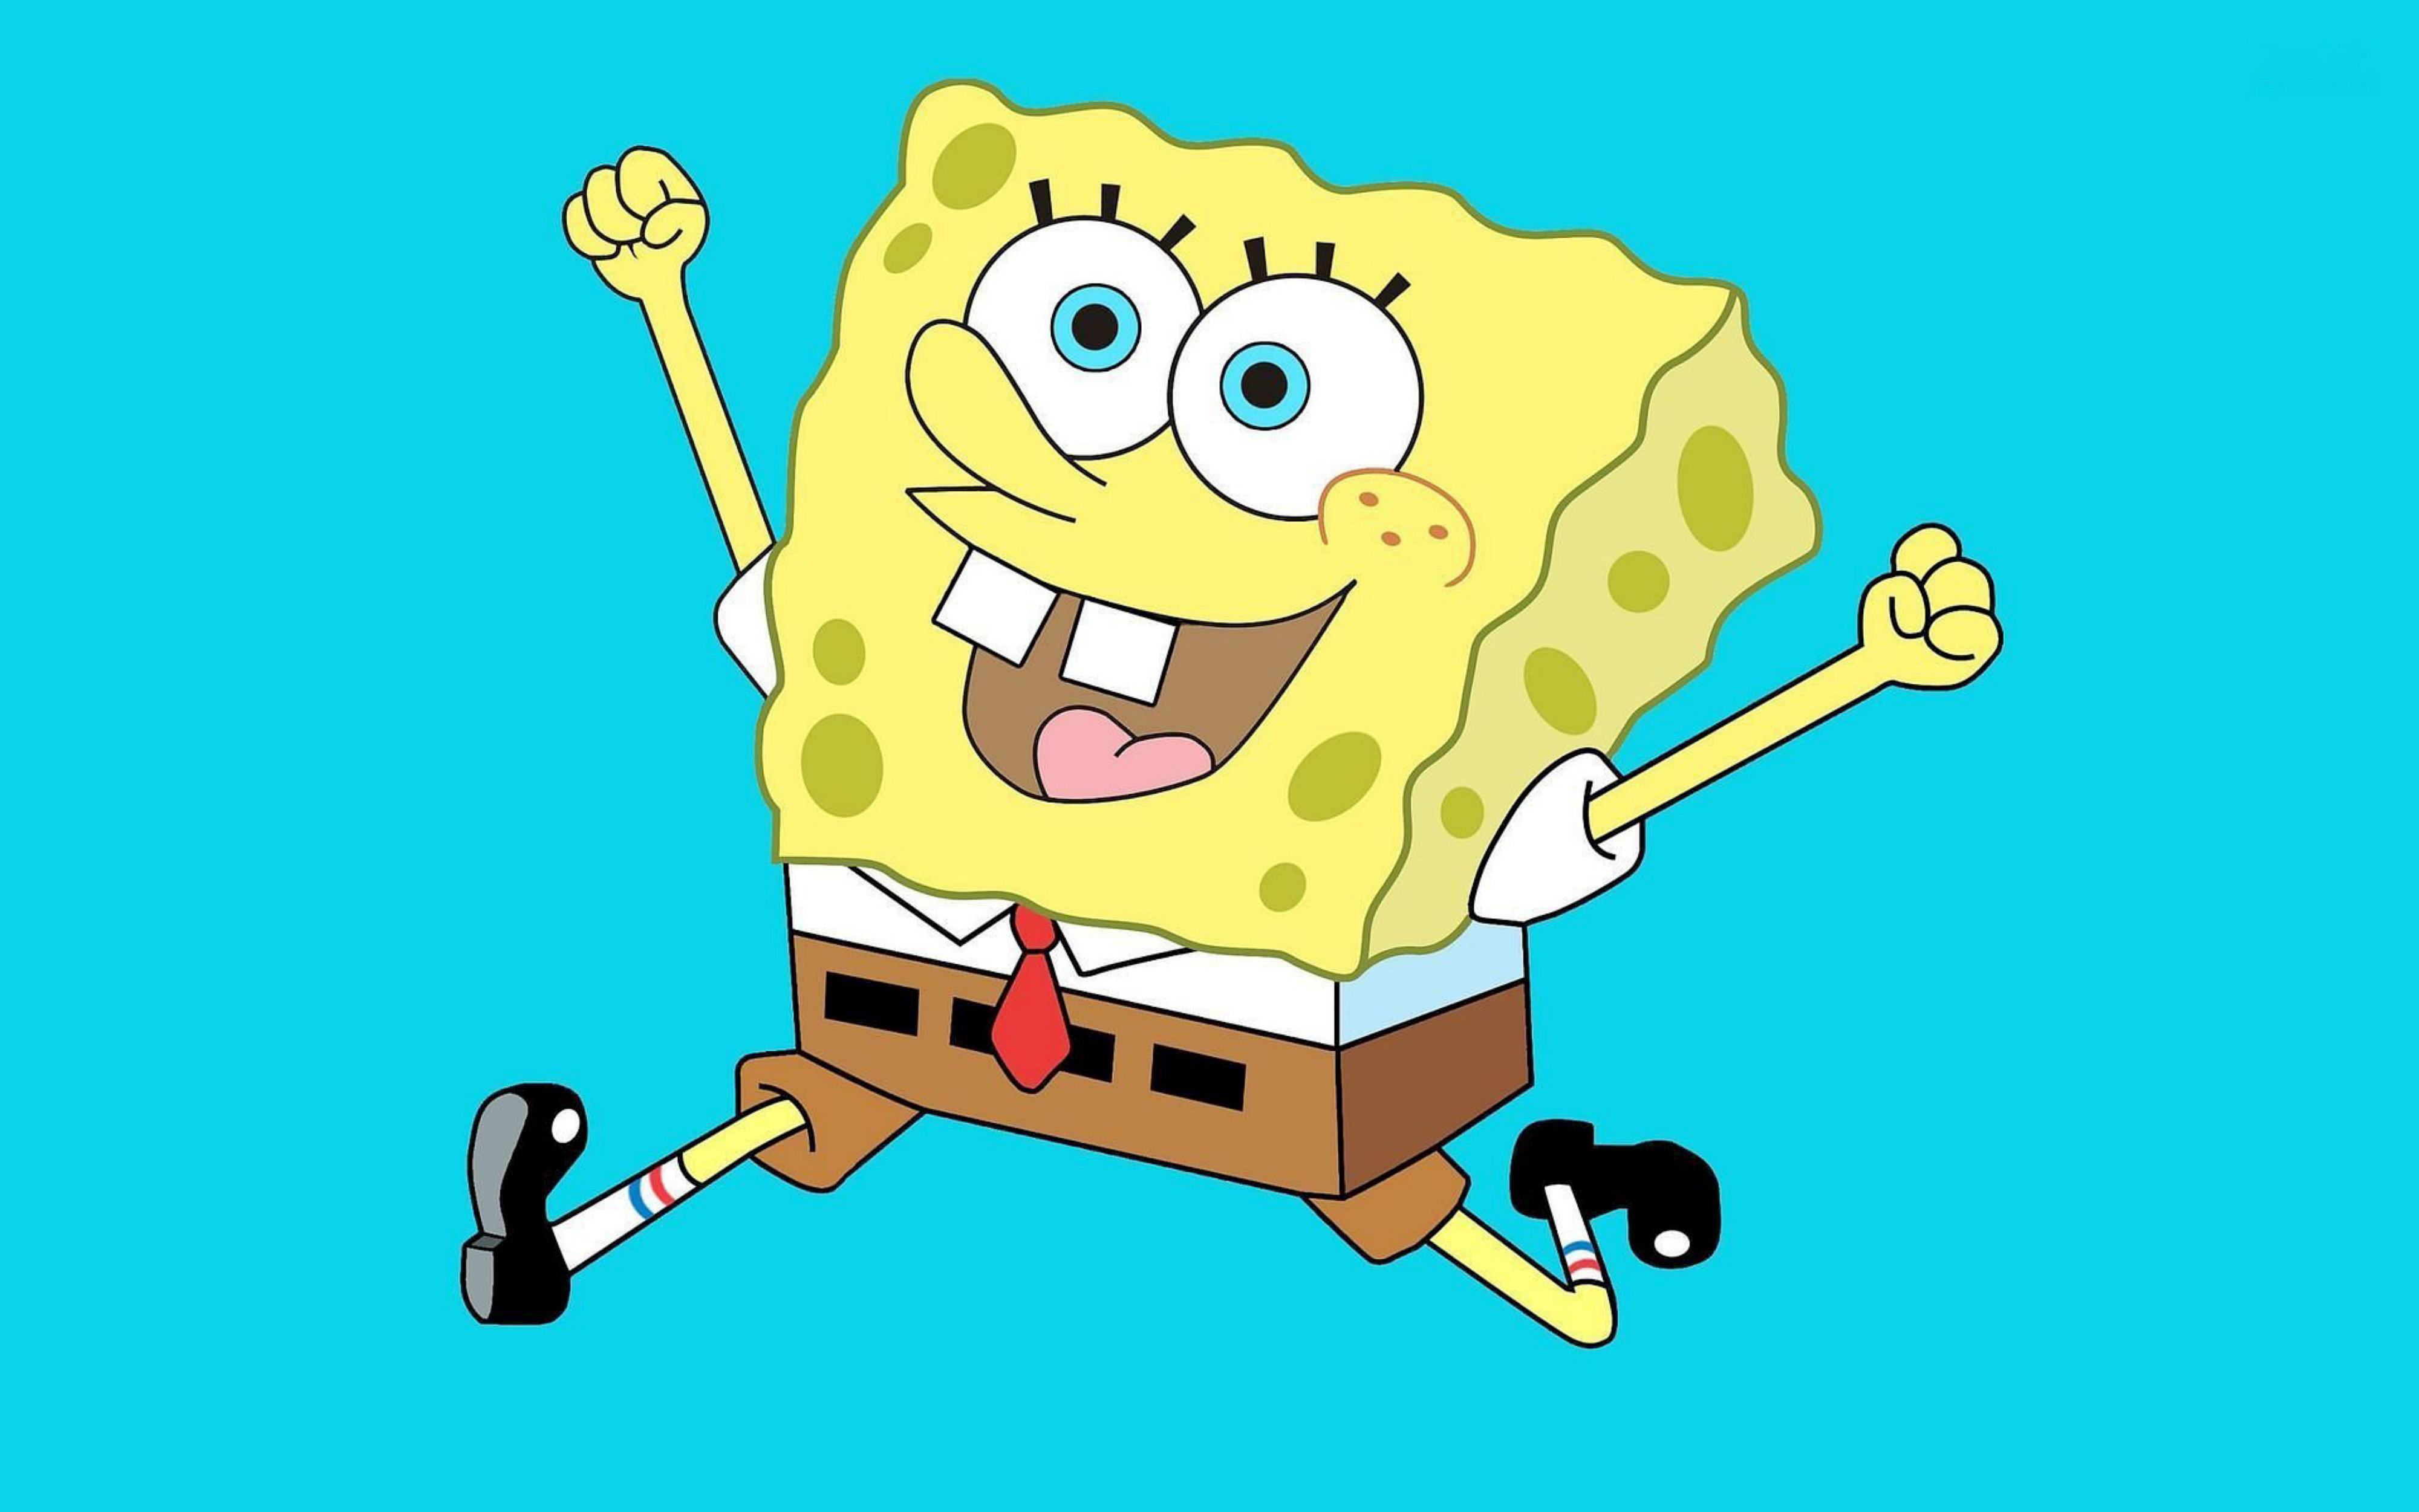 sponge bob 1m followers, 39 following, 507 posts - see instagram photos and videos from spongebob squarepants (@spongebob.